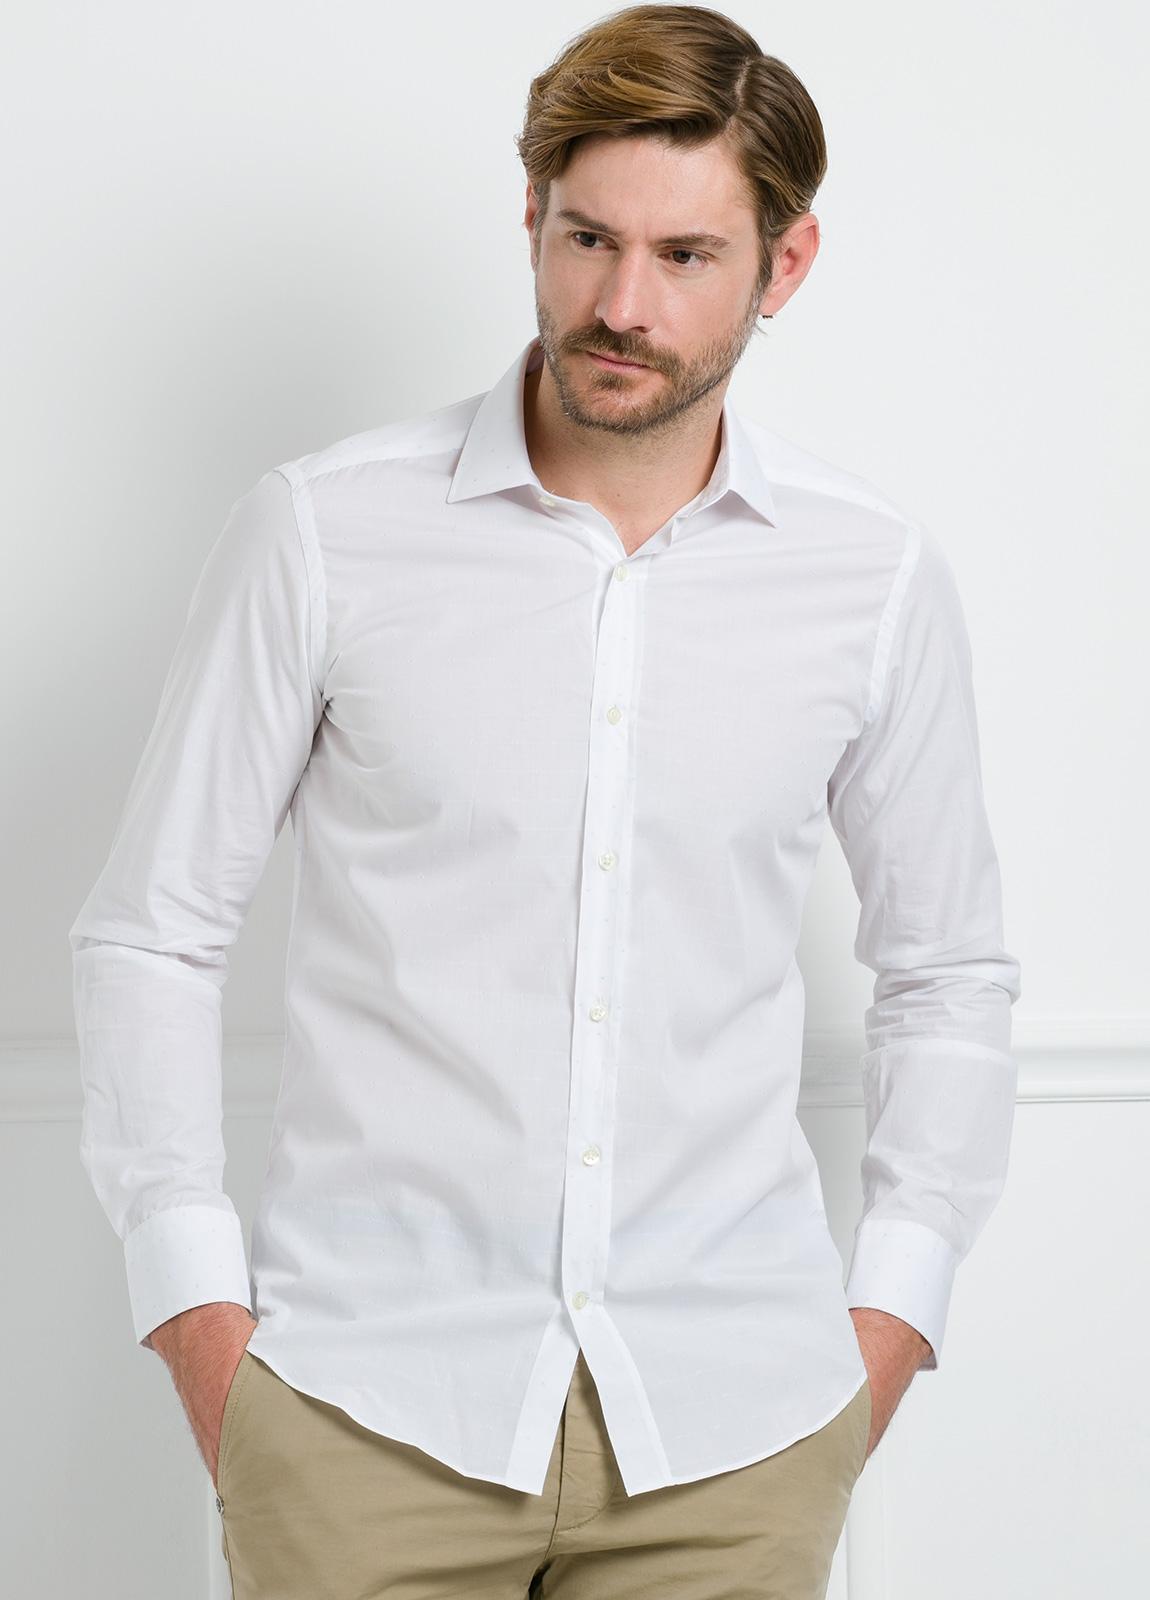 Camisa Formal Wear SLIM FIT cuello italiano modelo ROMA color blanco con micro dibujo color celeste. 100% Algodón. - Ítem4